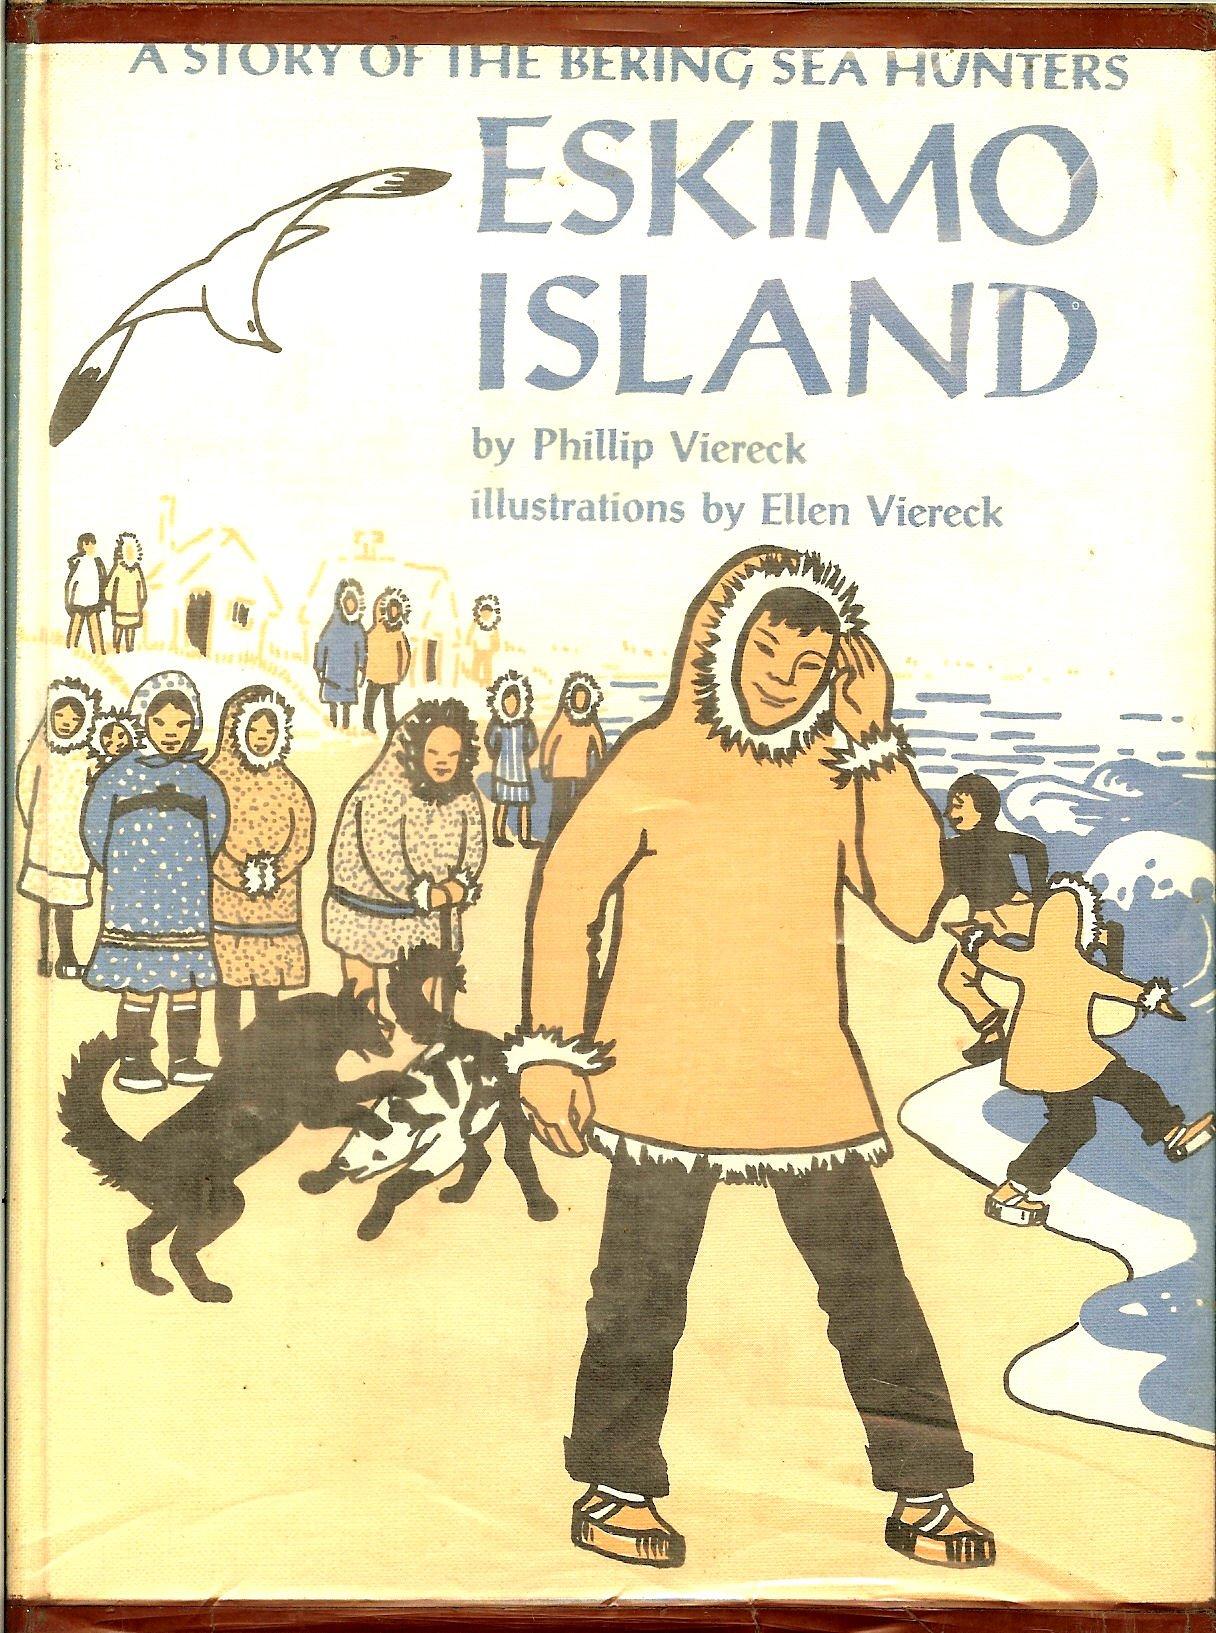 Eskimo Island: A story of the Bering Sea Hunters, Phillip Viereck